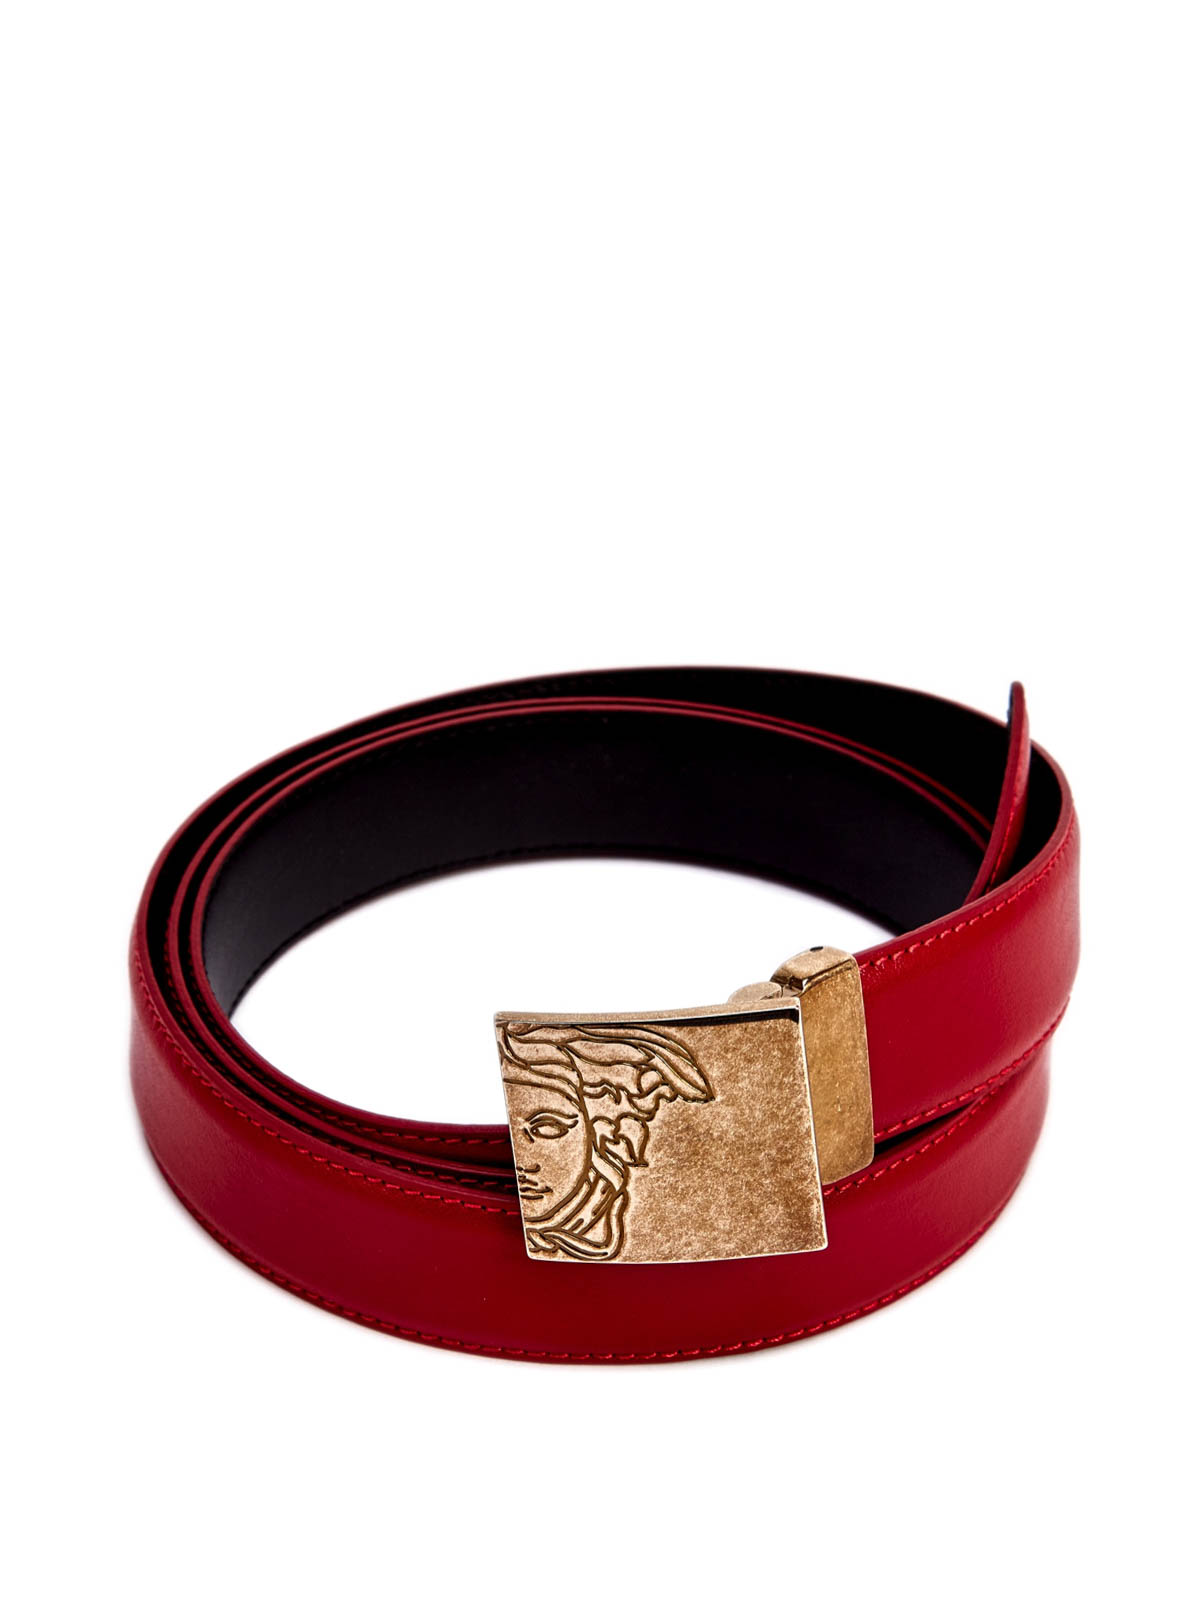 Versace Collection - Medusa Buckle Belt - Belts